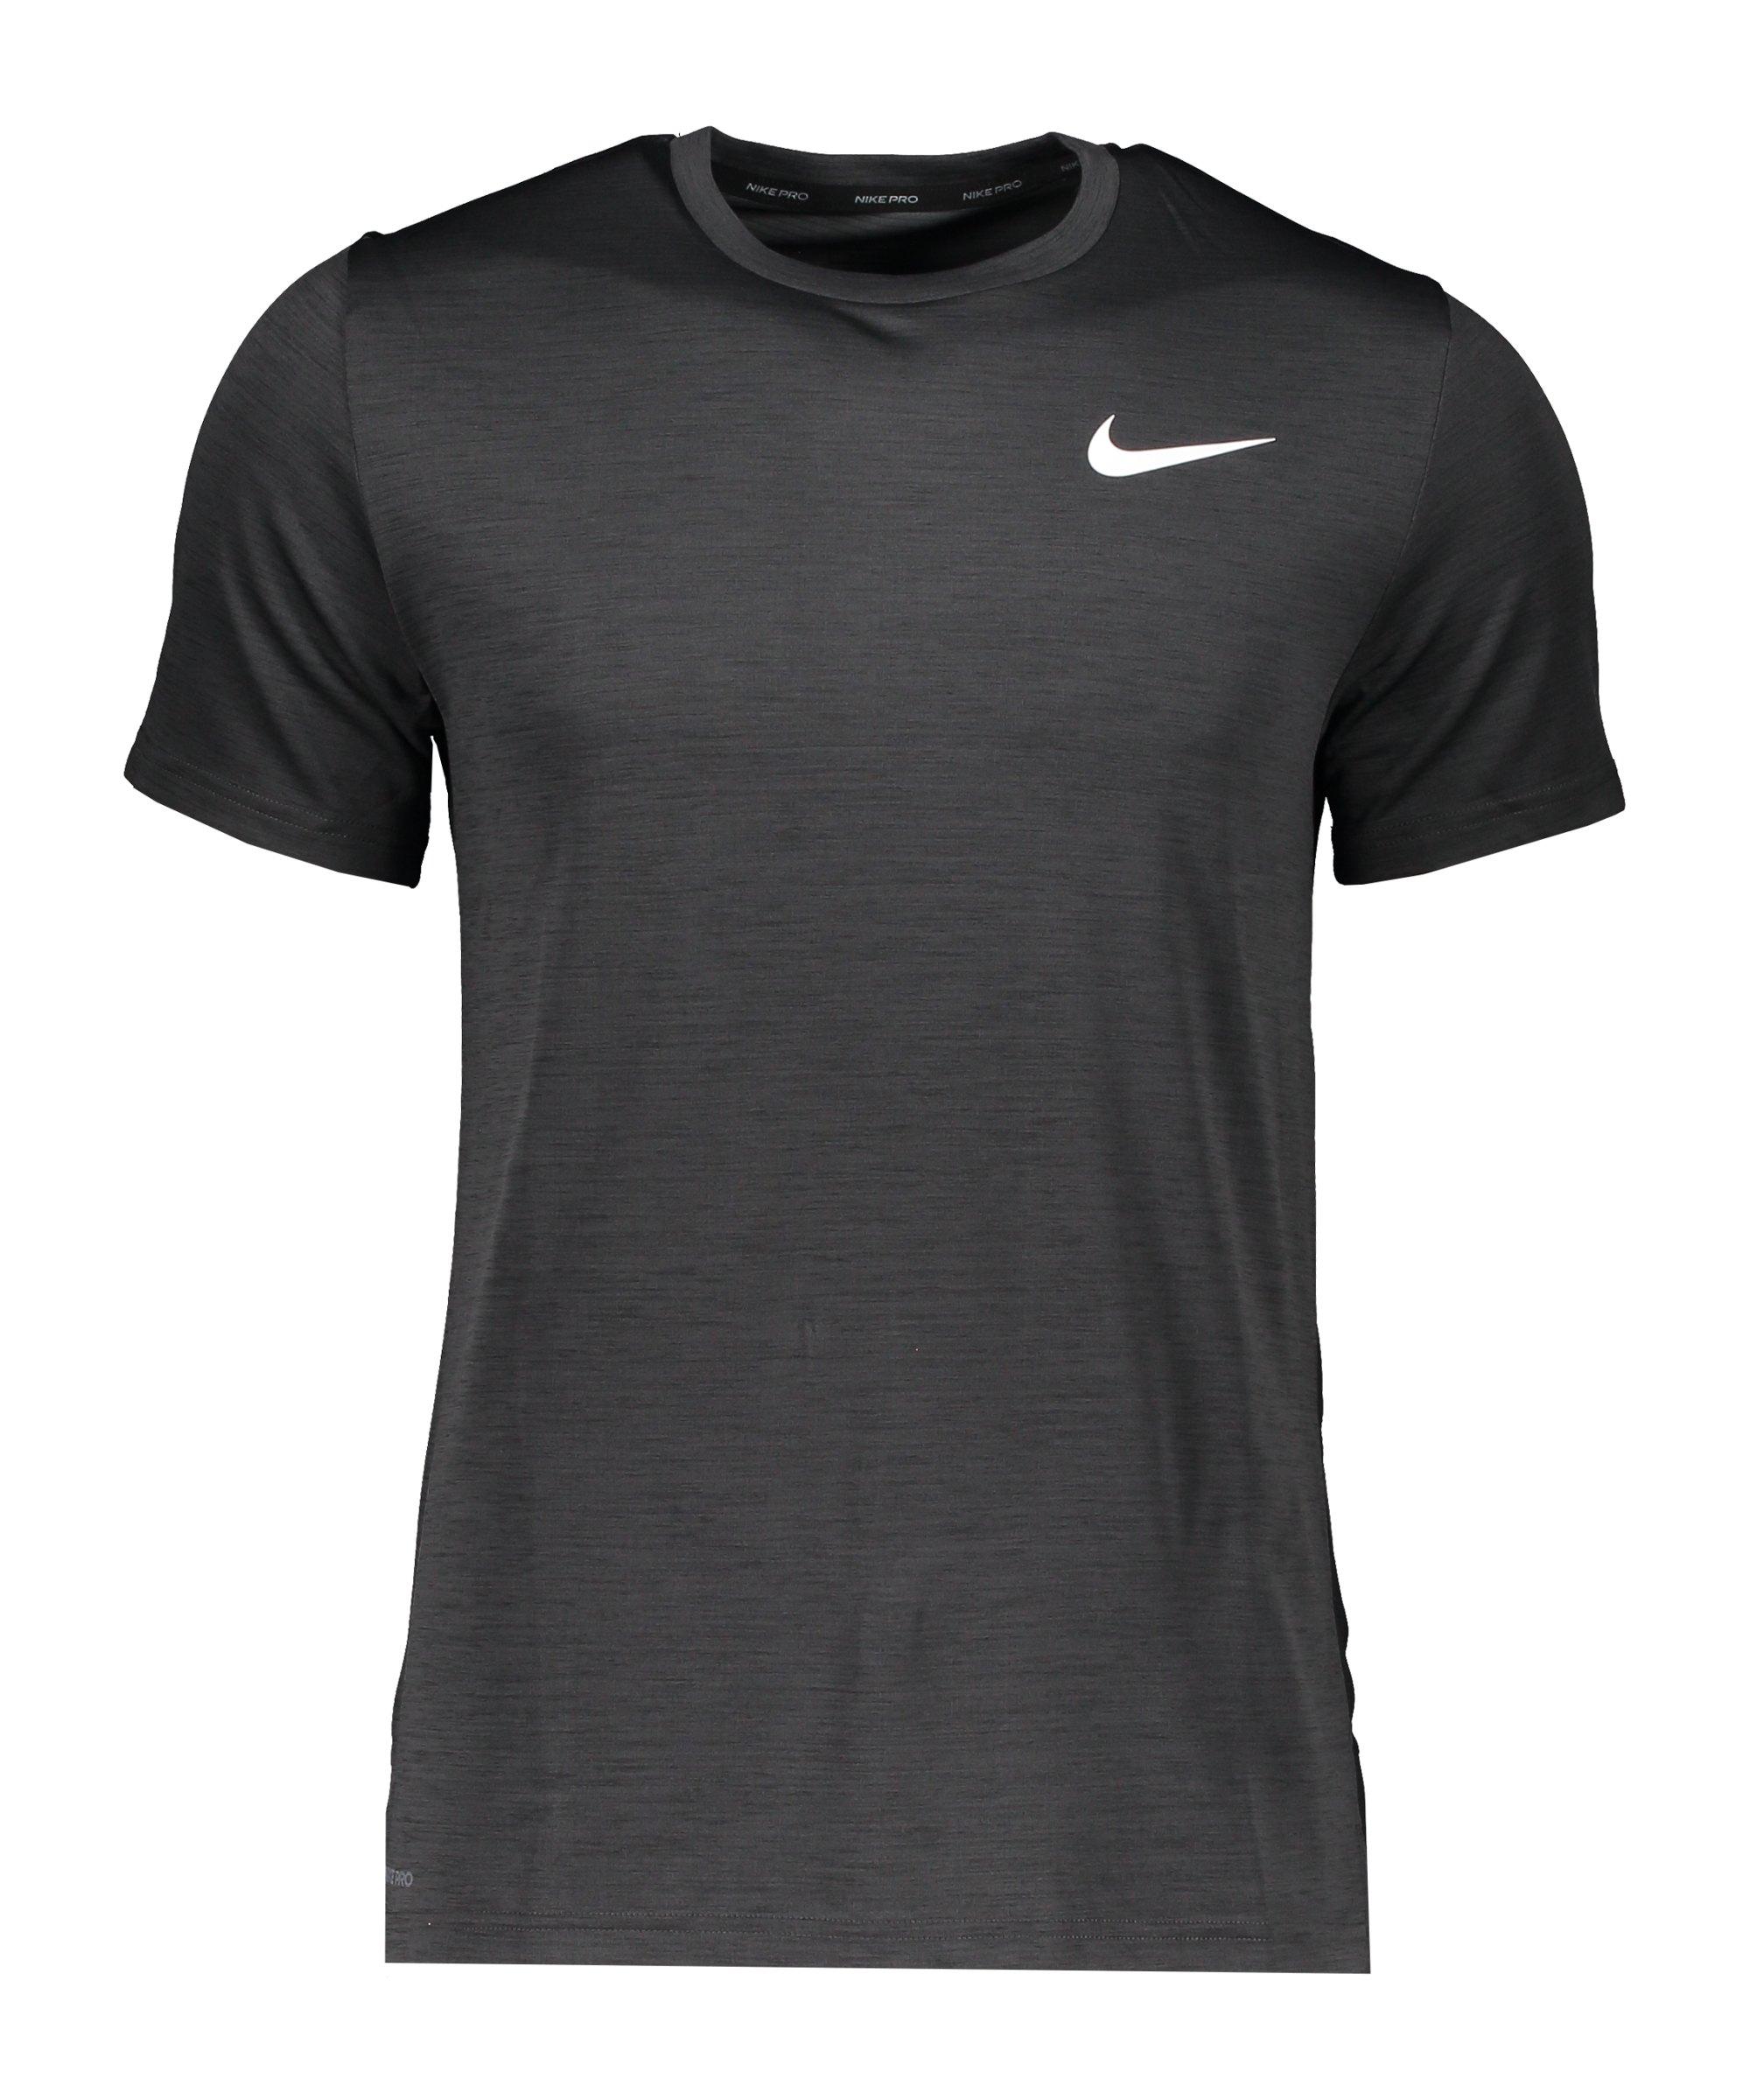 Nike Hyper Veneer T-Shirt Grau Schwarz Weiss F010 - schwarz